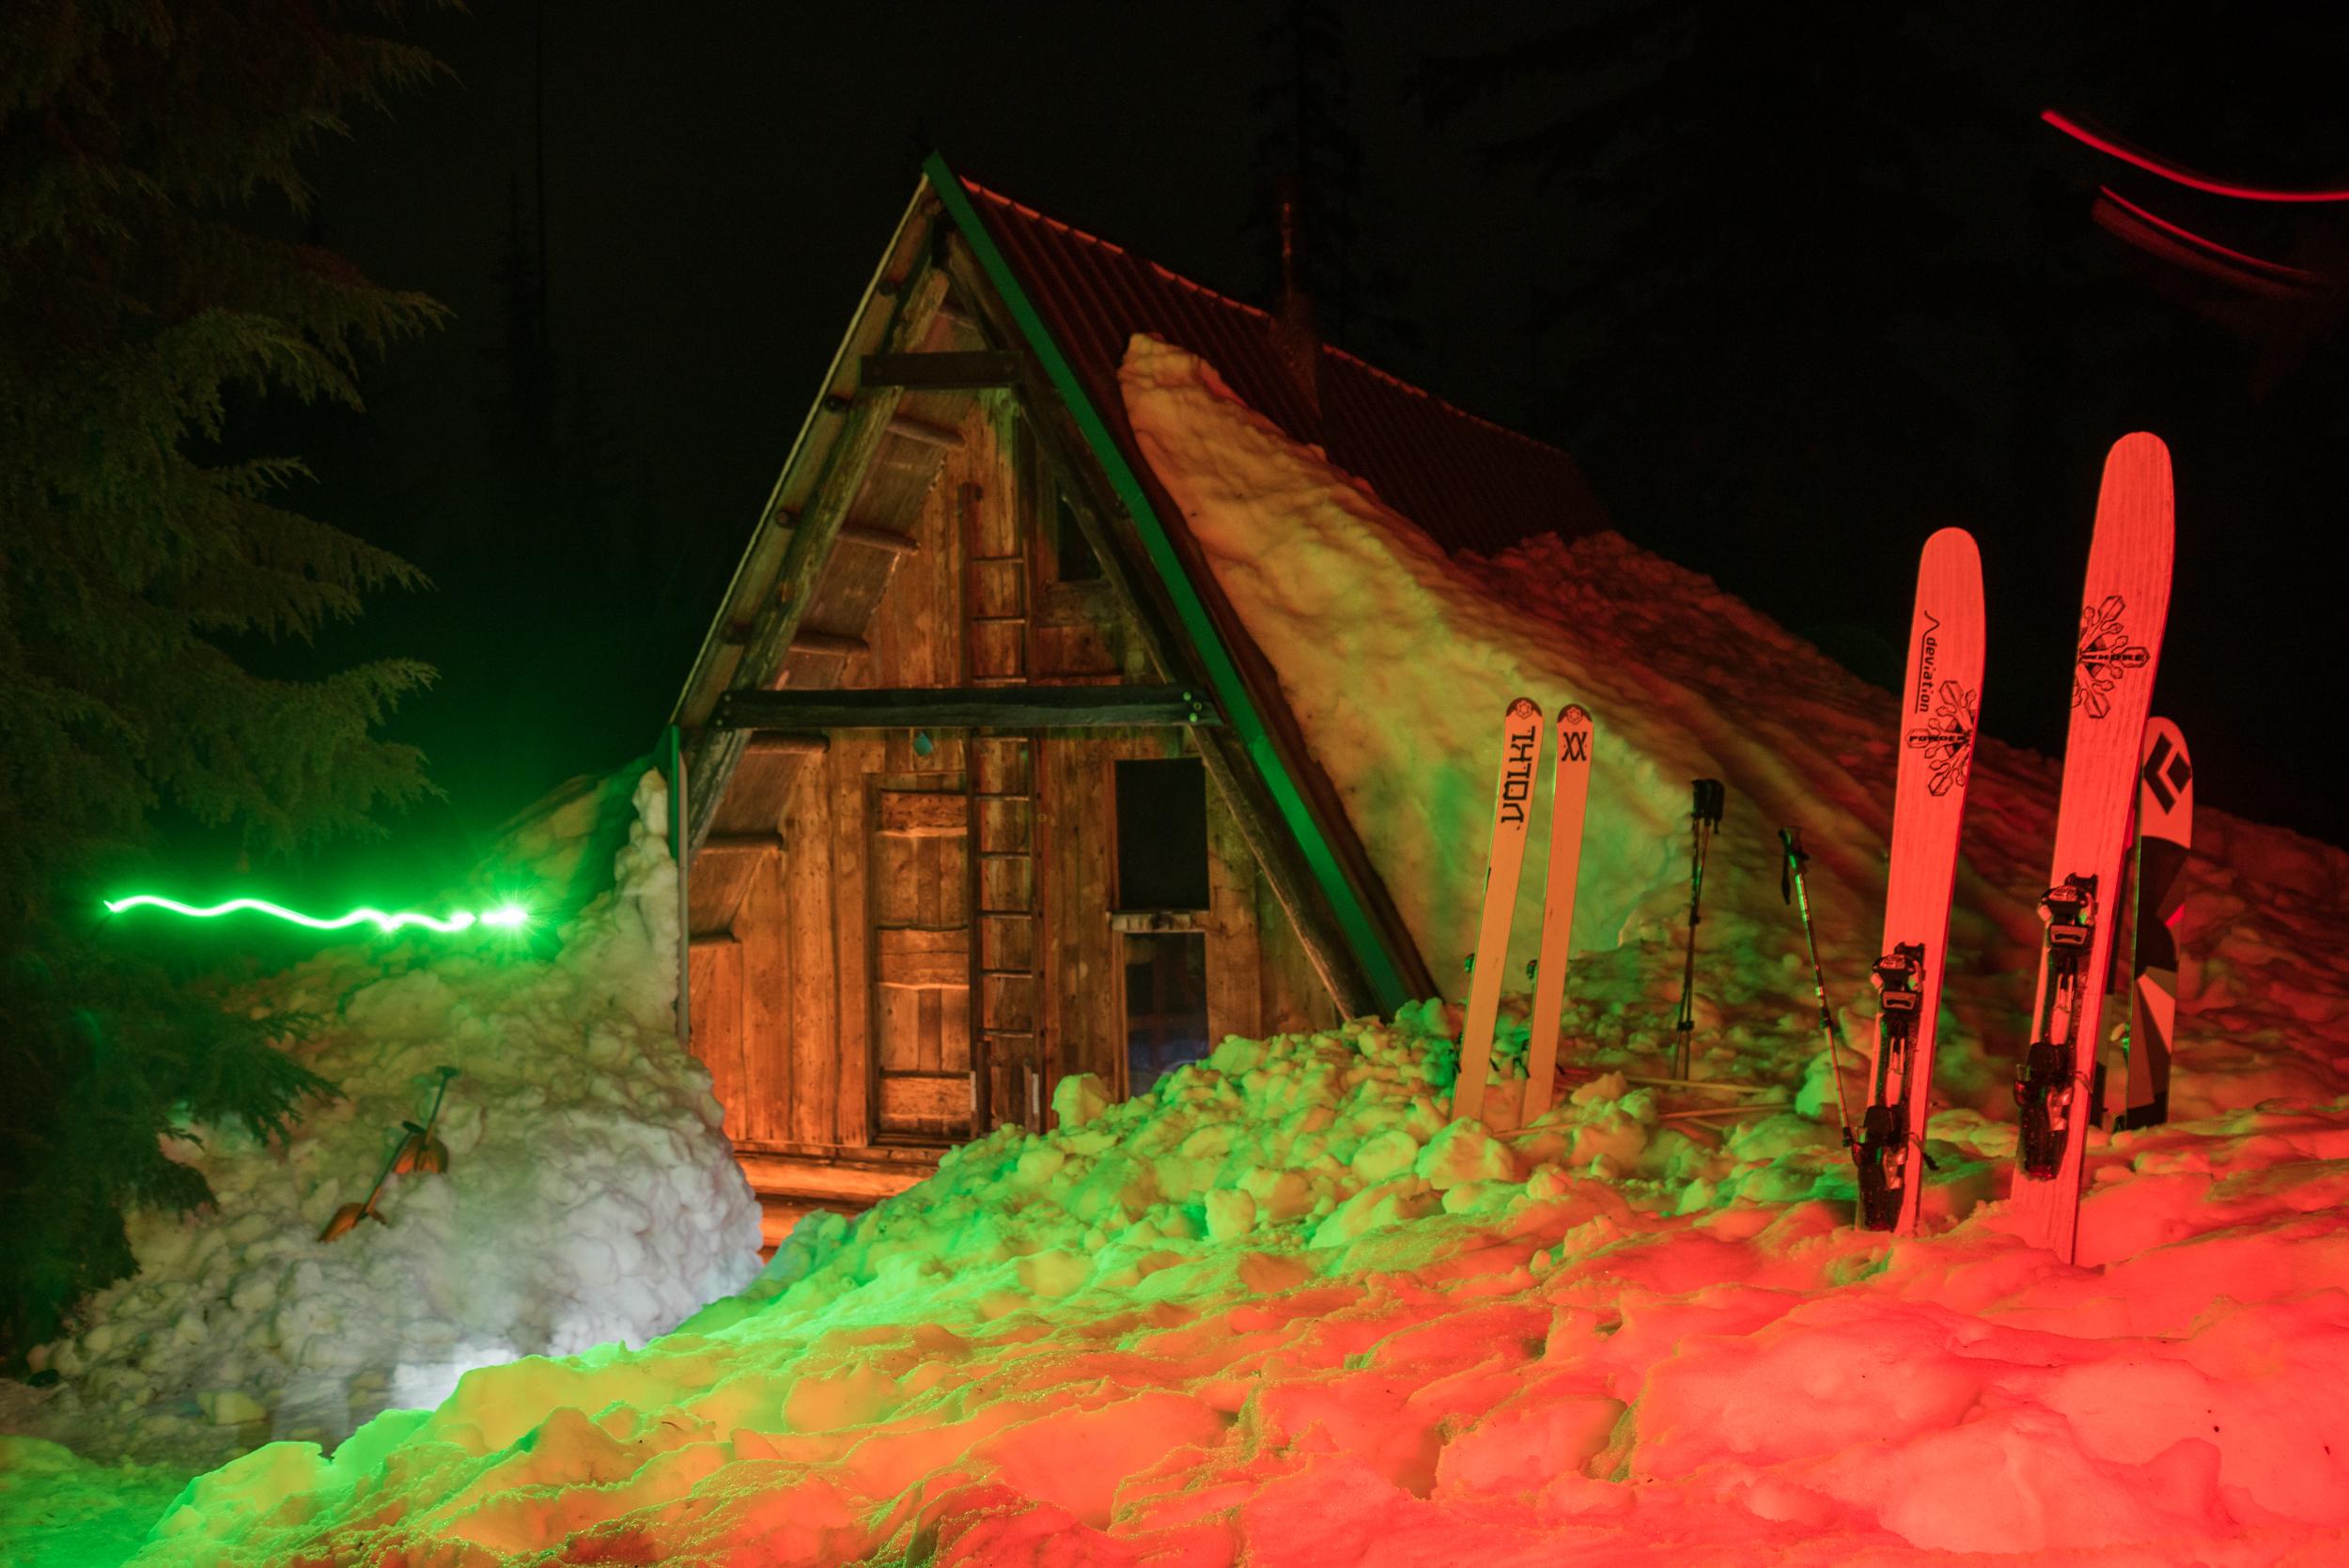 Hemlock-Butte-Steve-Aliberti-7090.jpg